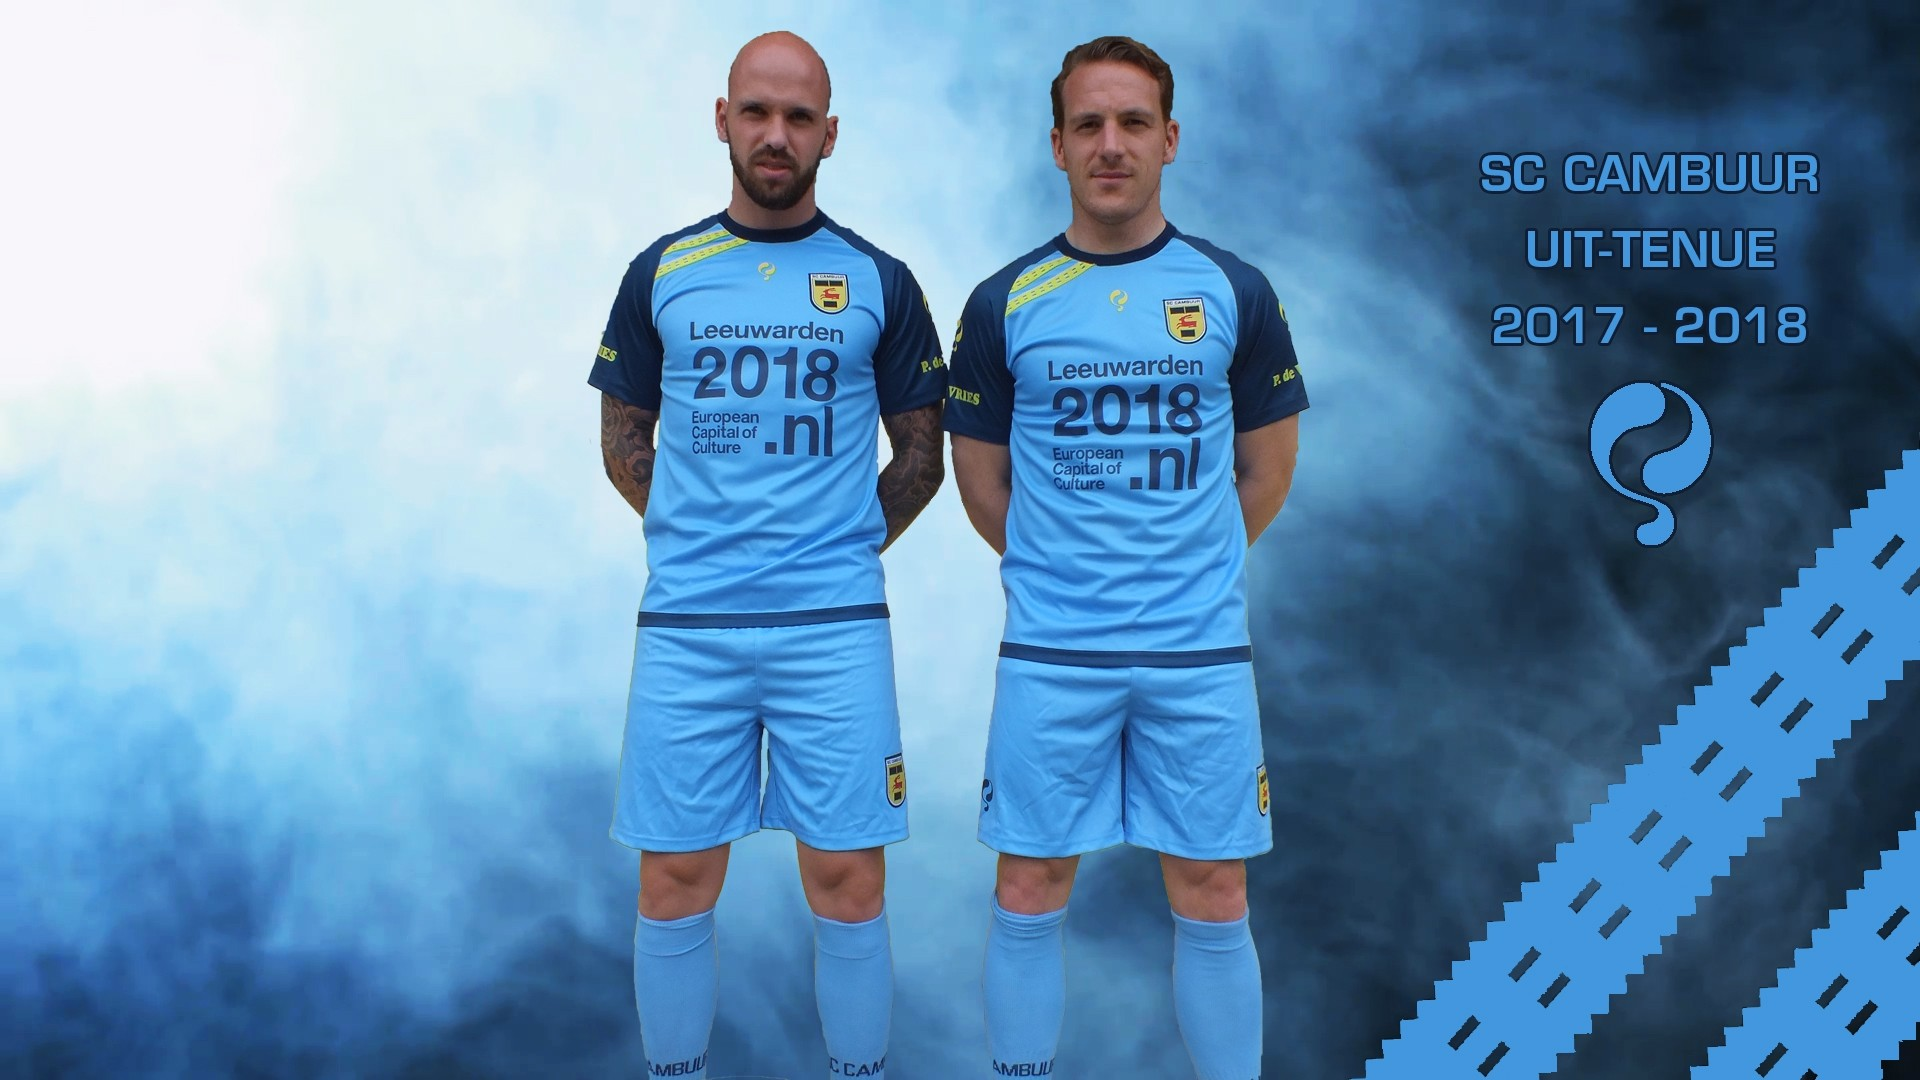 Sc Cambuur Voetbalshirts 2017 2018 Voetbalshirts Com